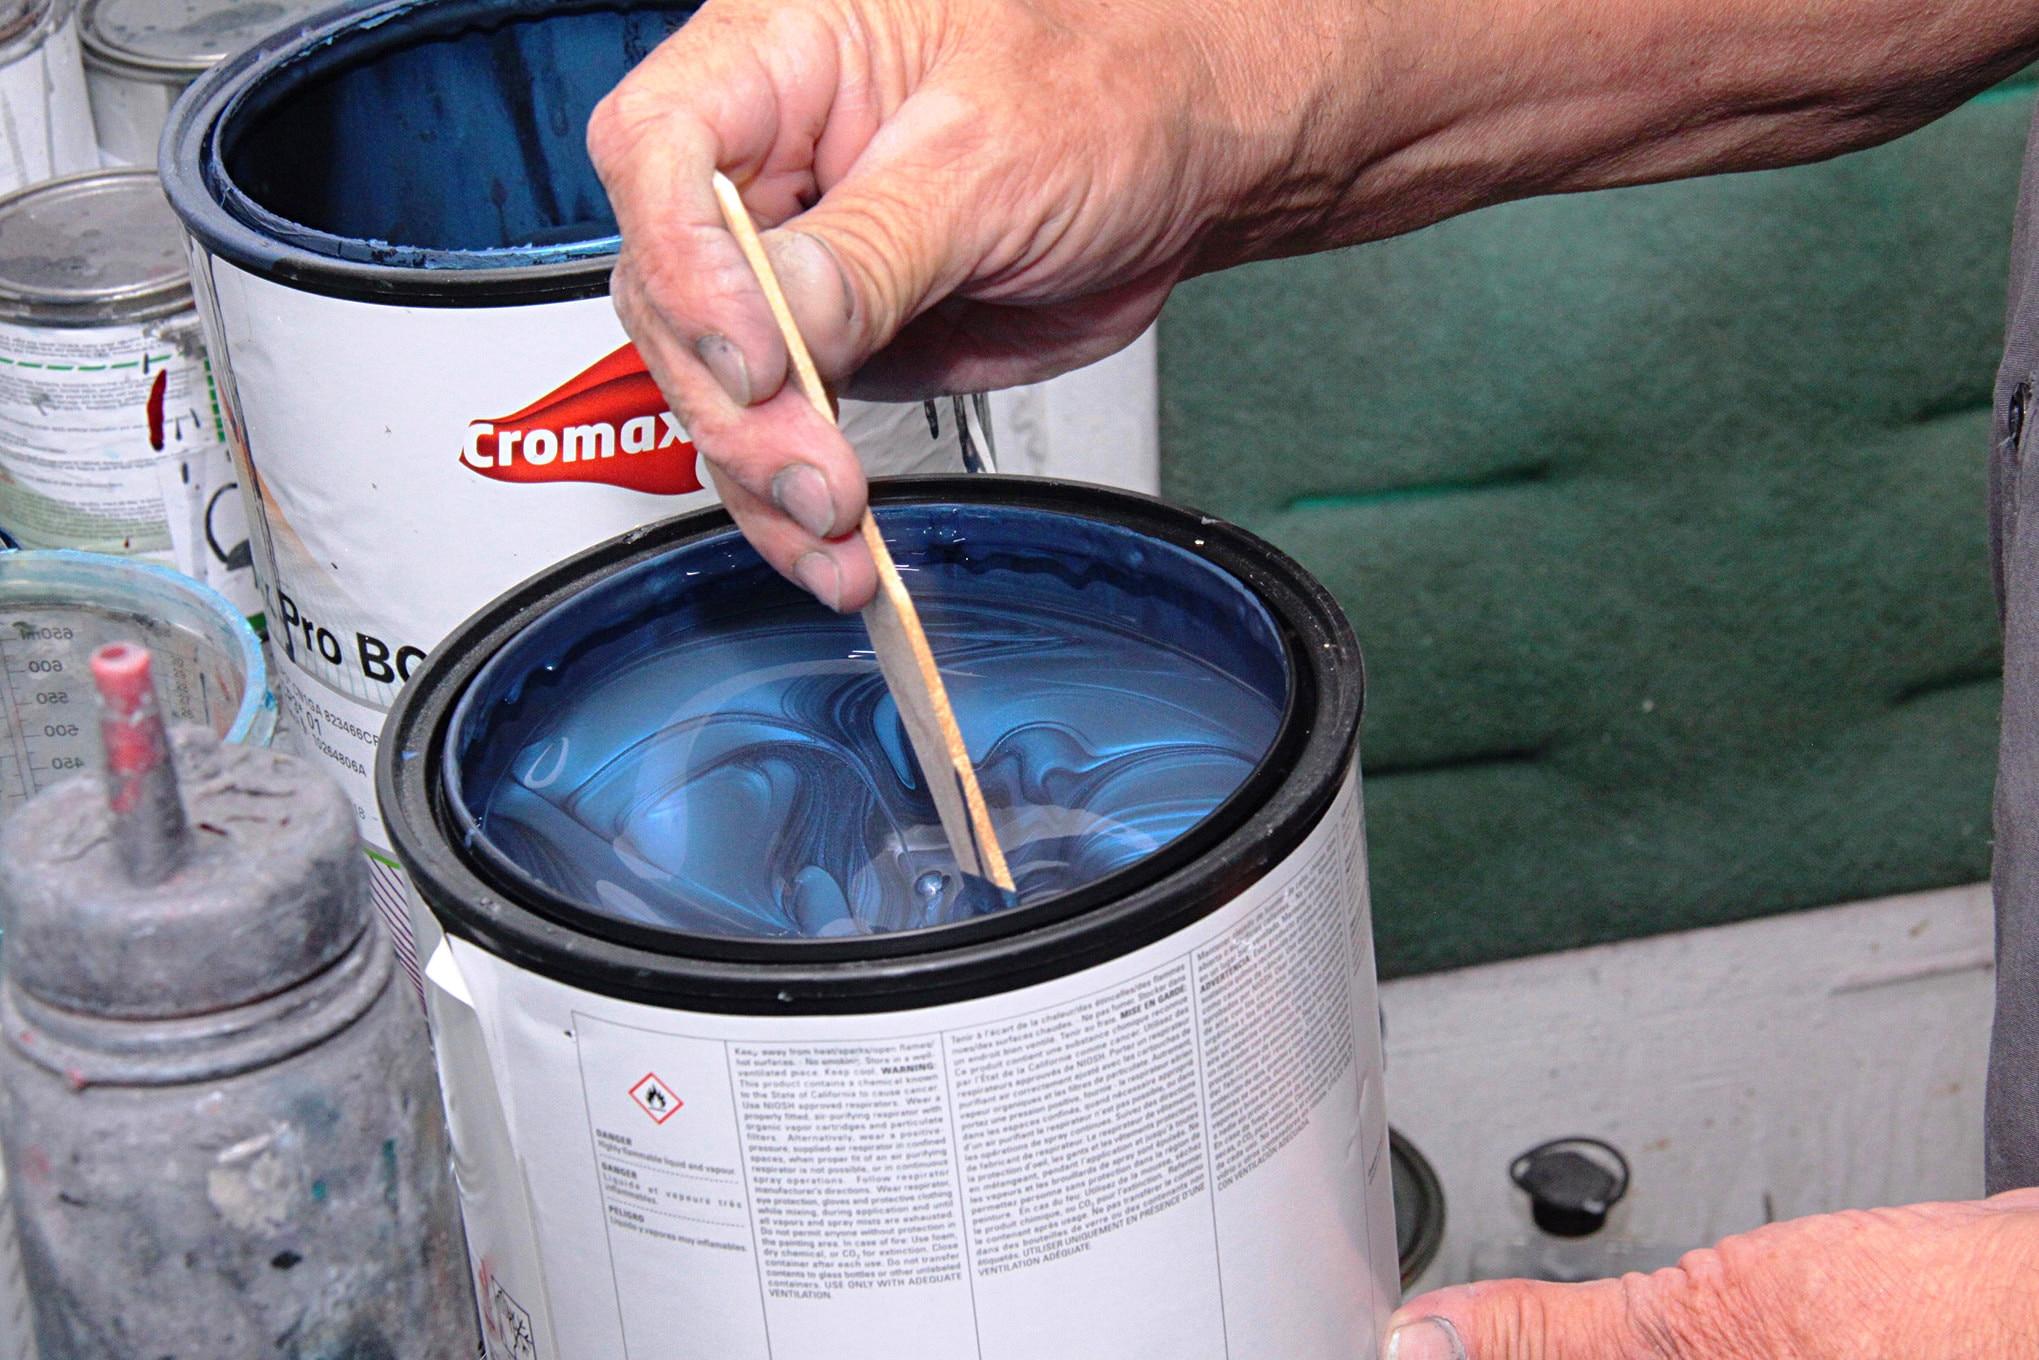 003 1999 Mustang Gt Paint Preparation Axalta Fitment